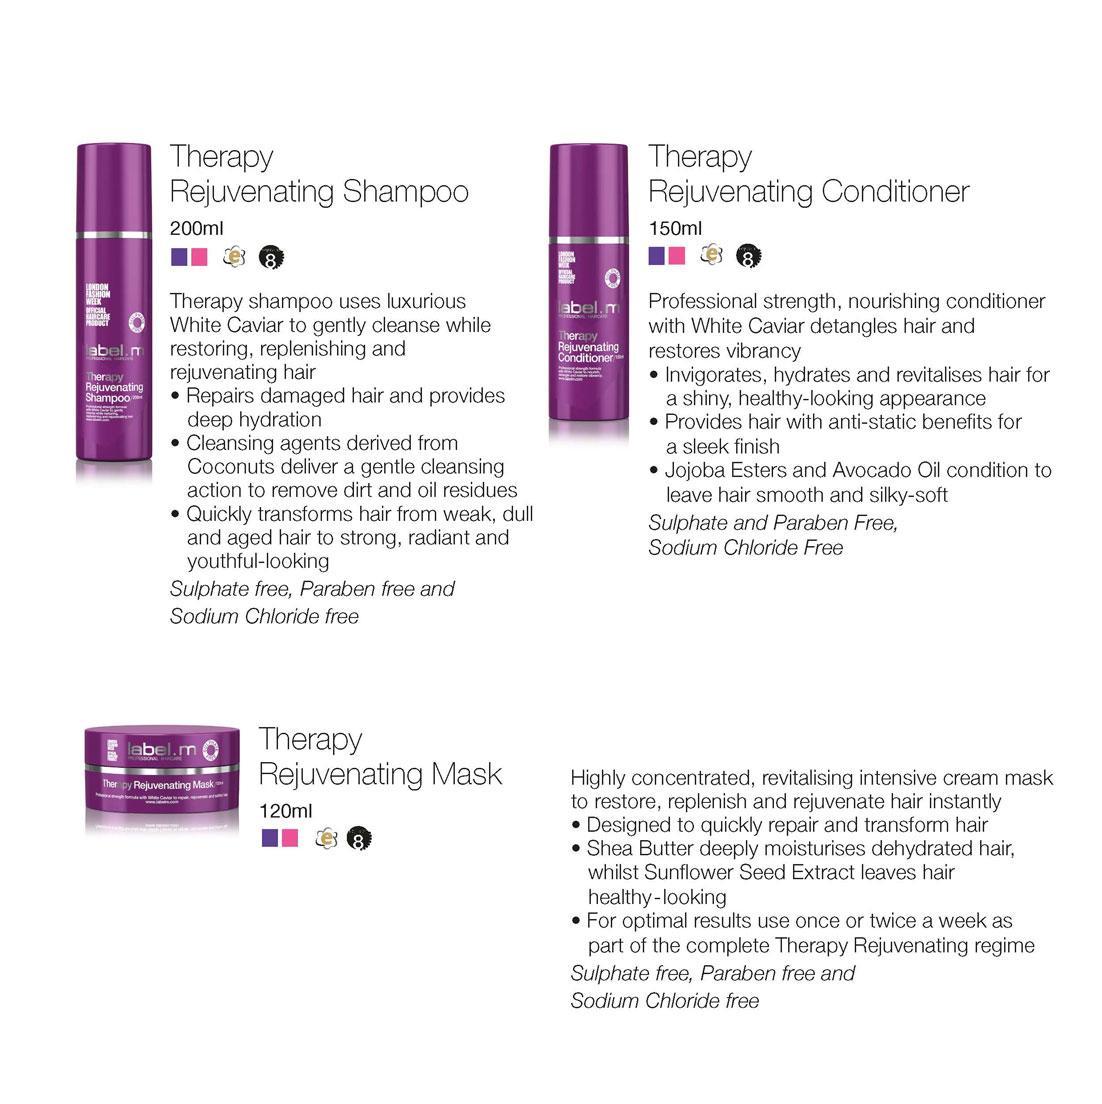 587.9-label-m-therapy-rejuvenating-3-pg-36.jpg